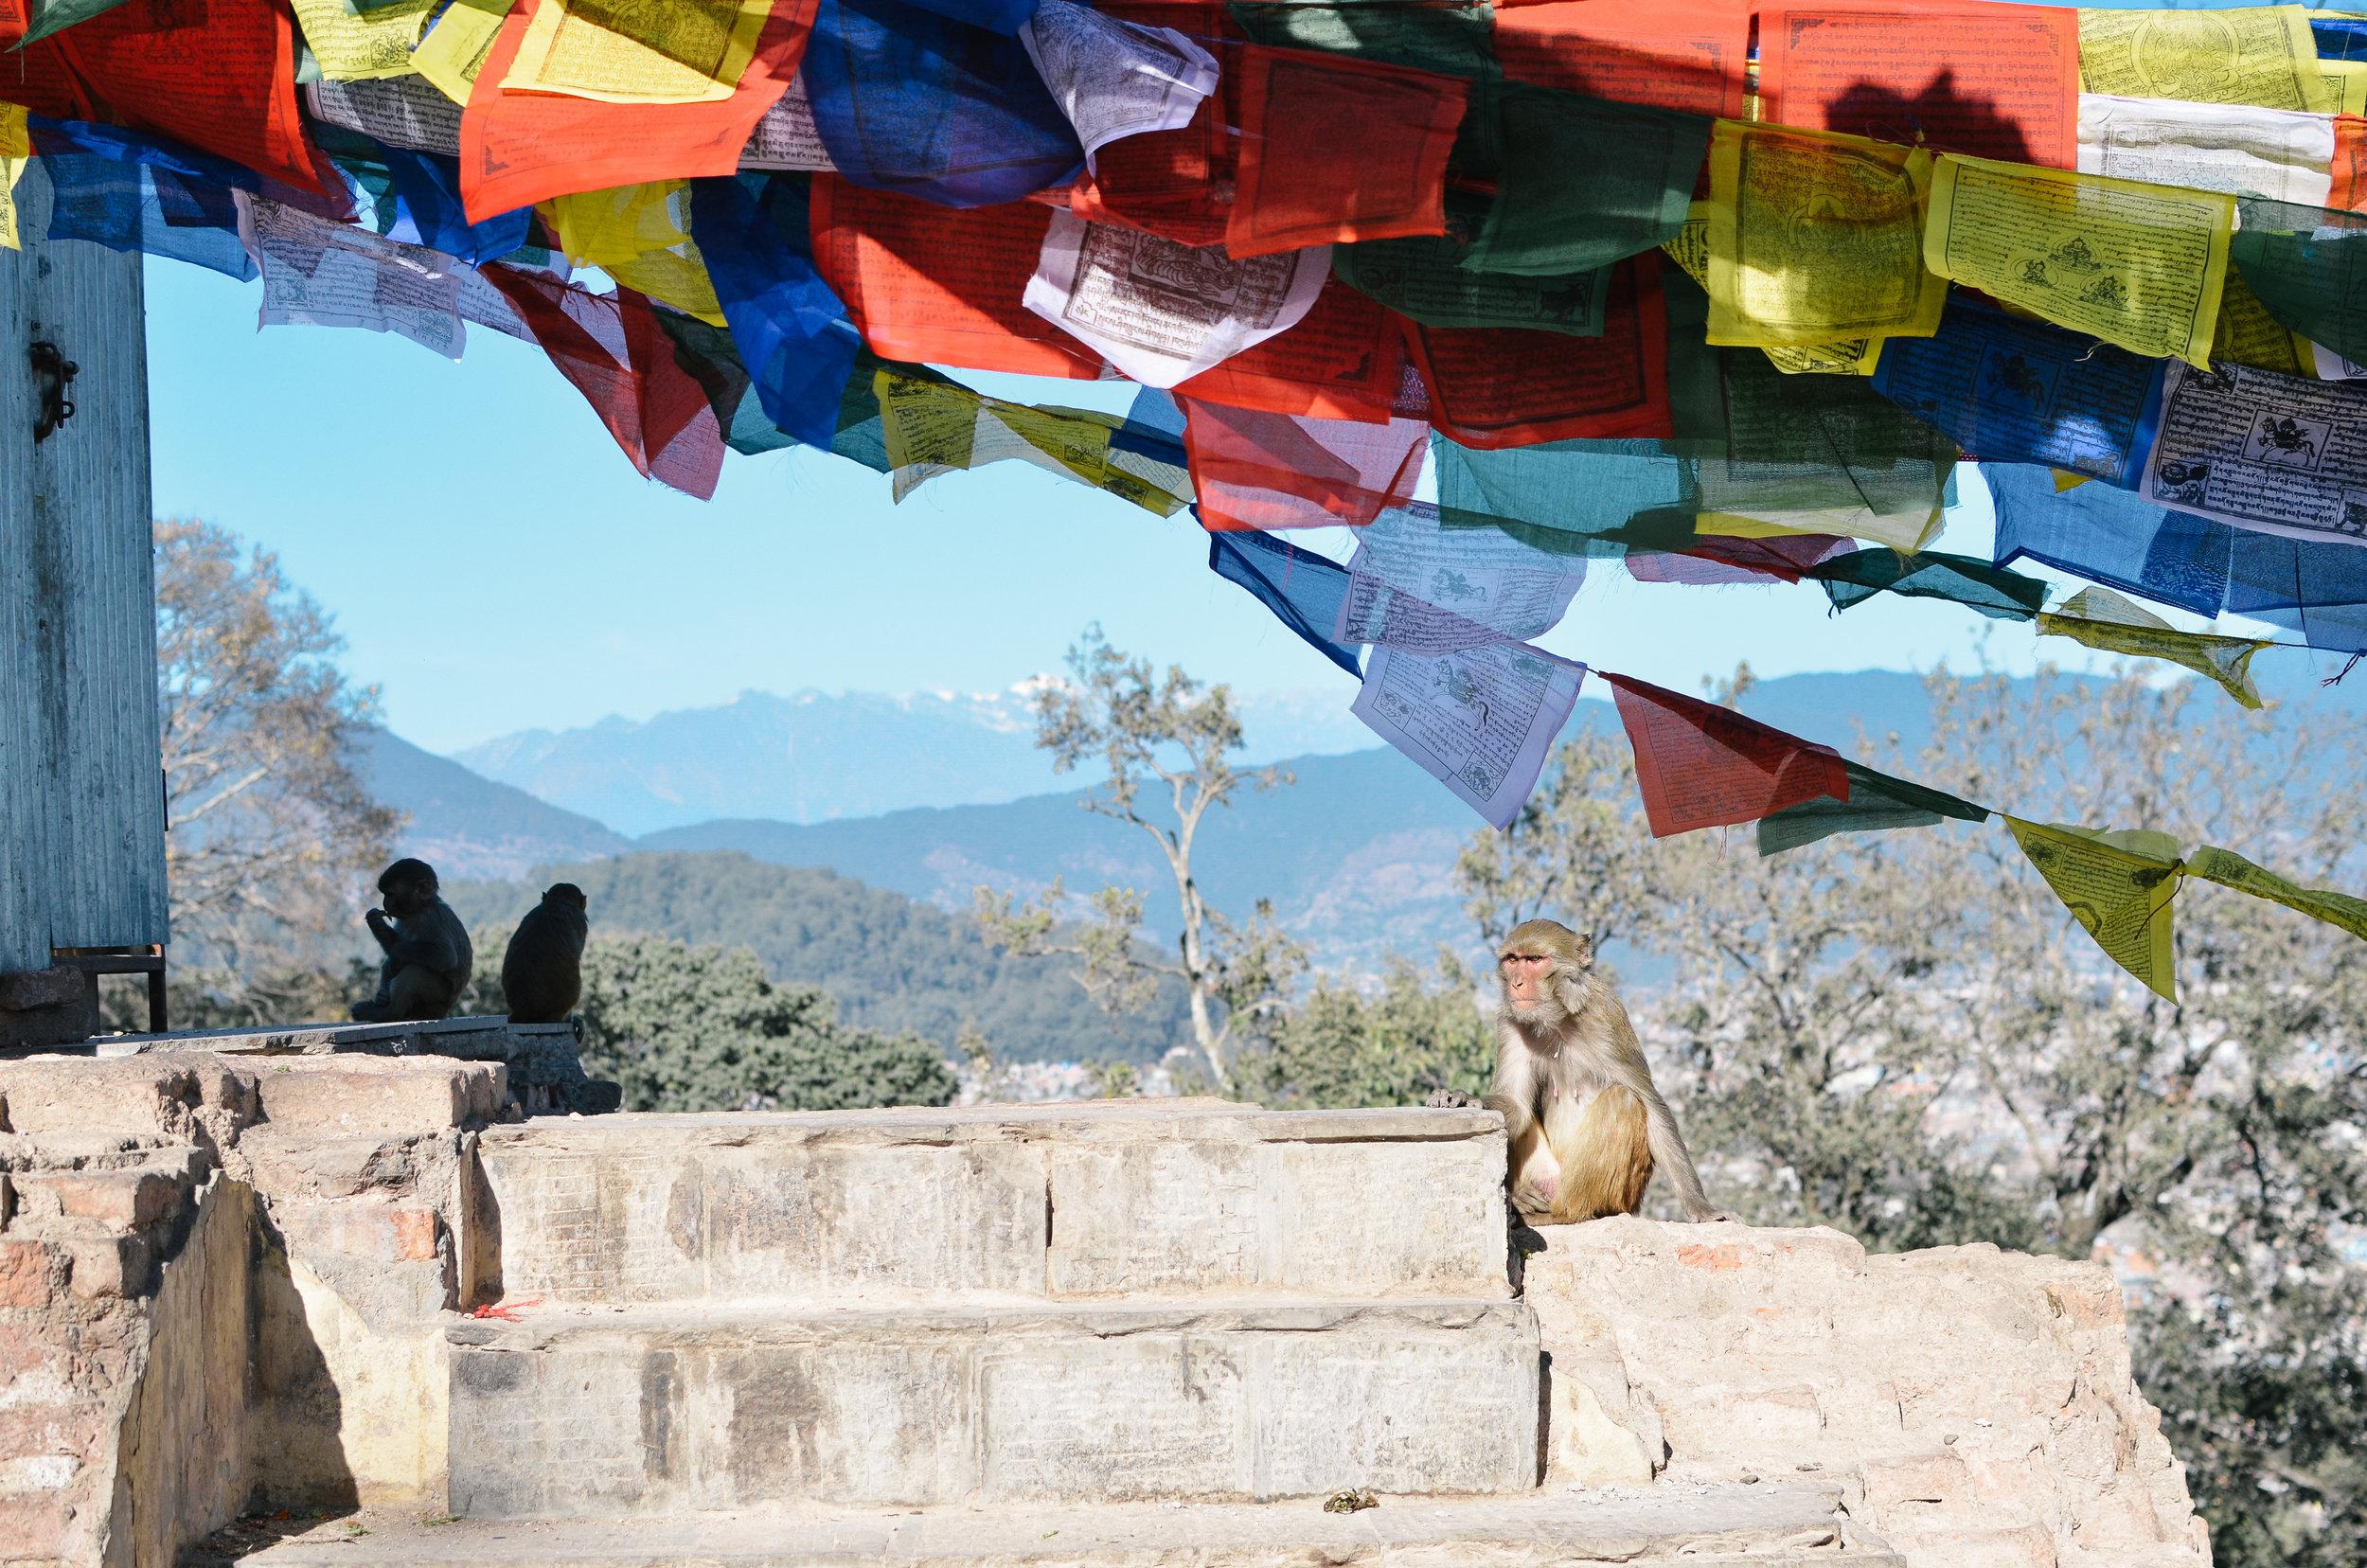 10-things-to-know-kathmandu-nepal-lifeonpine_DSC_1734.jpg